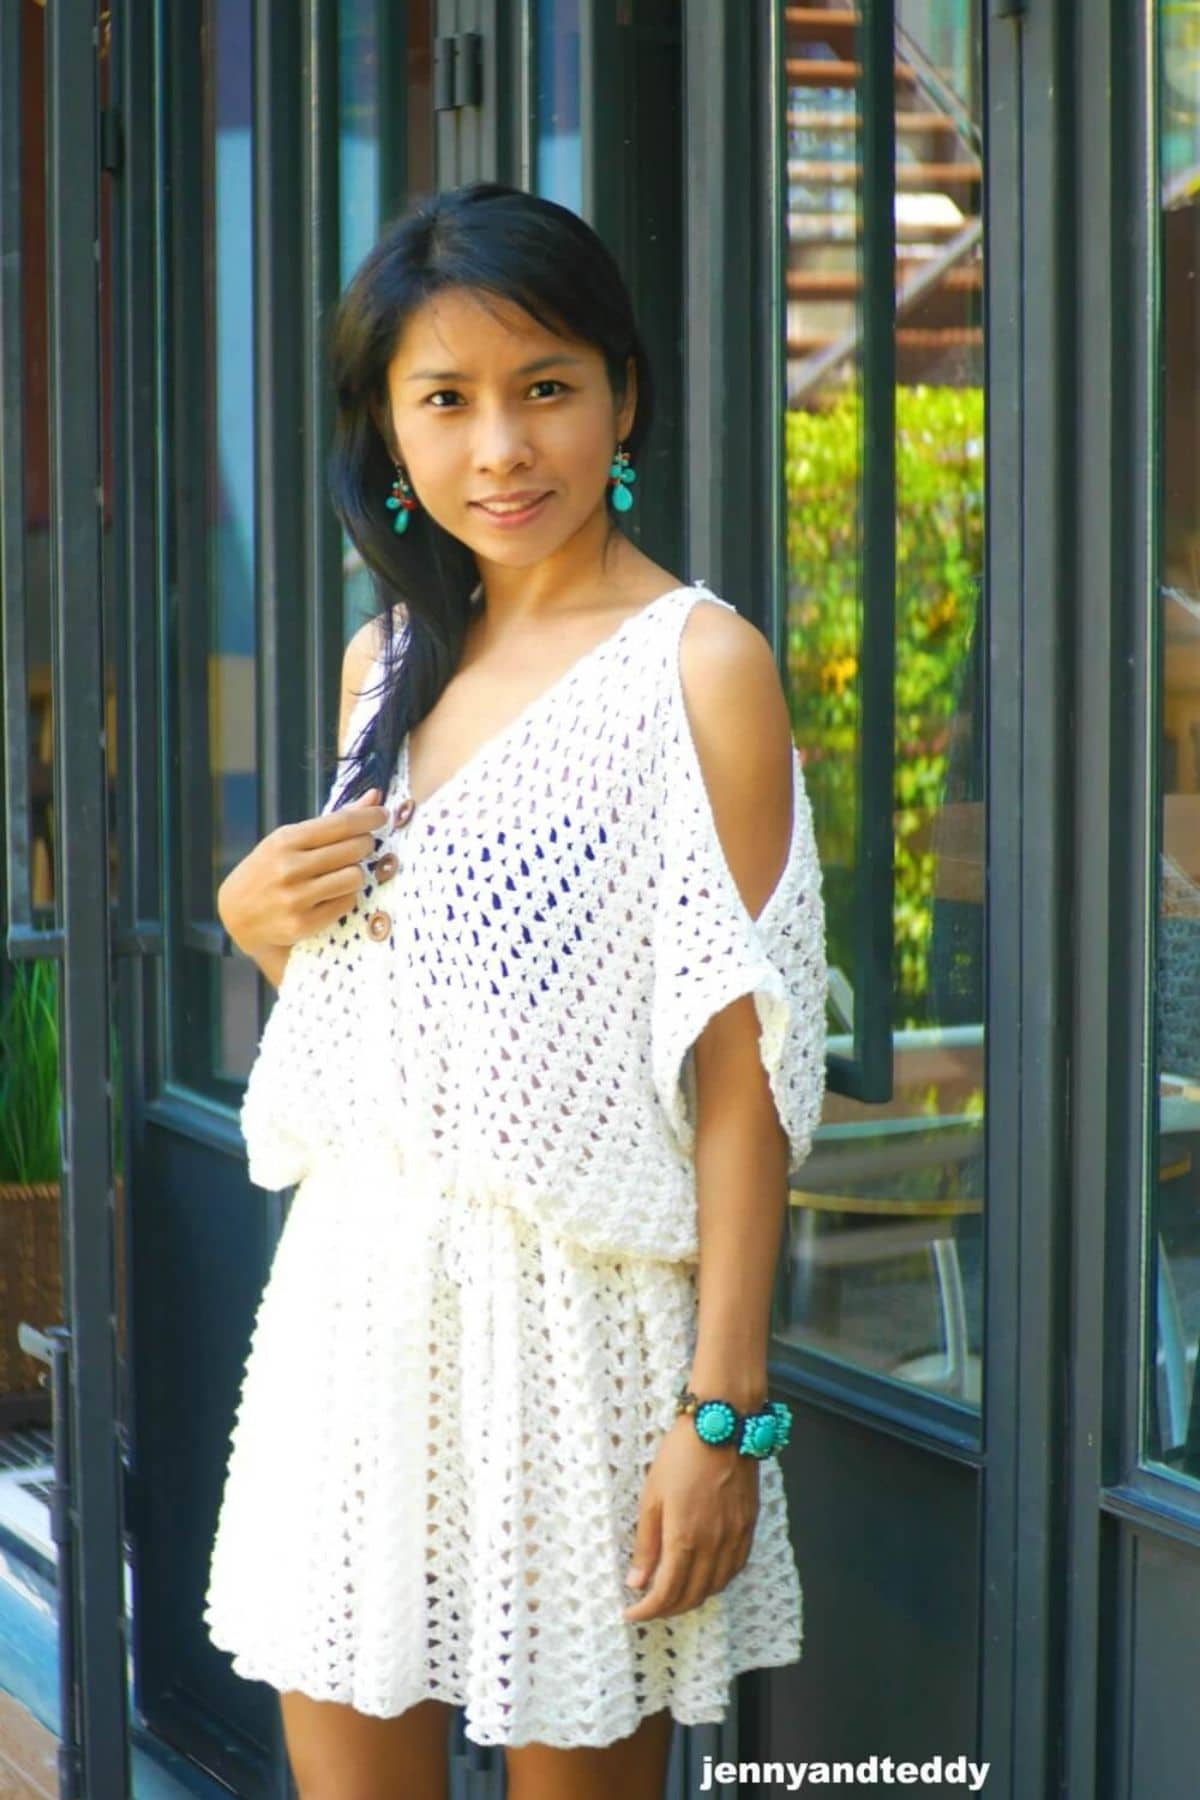 Woman wearing white boho dress against fence